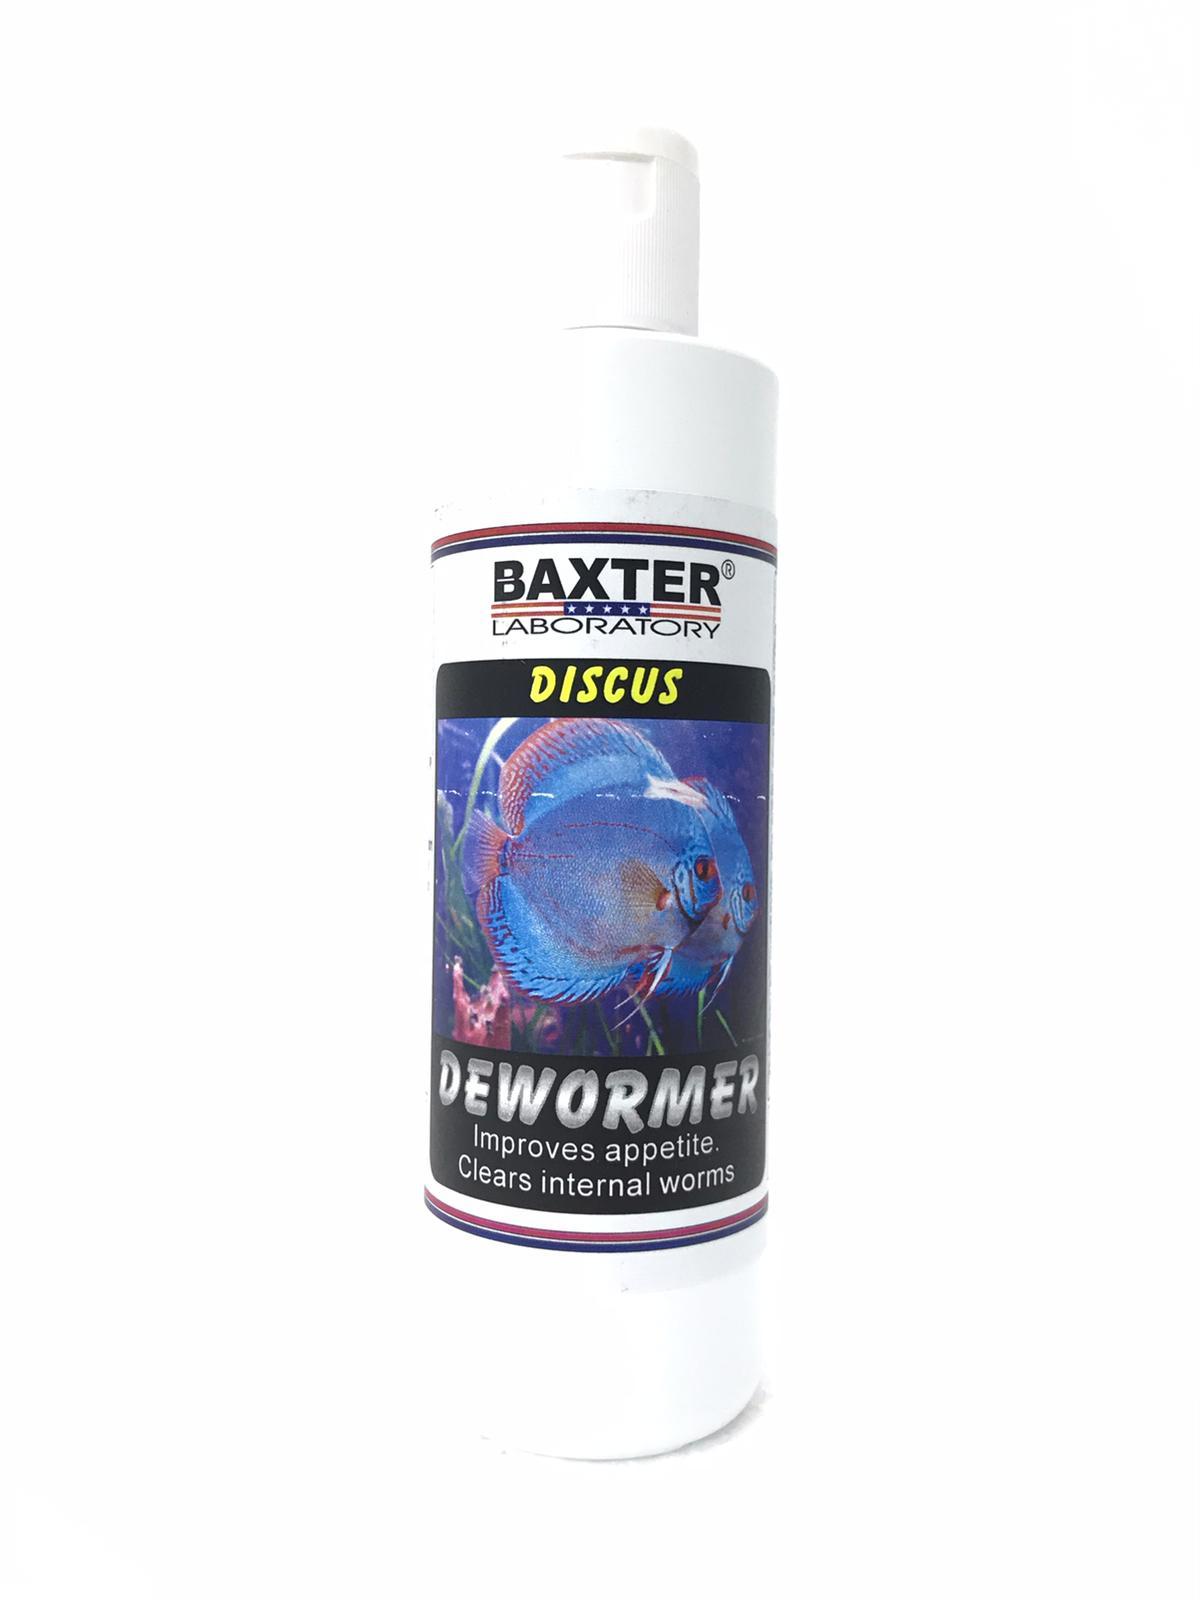 Baxter Discus Dewormer